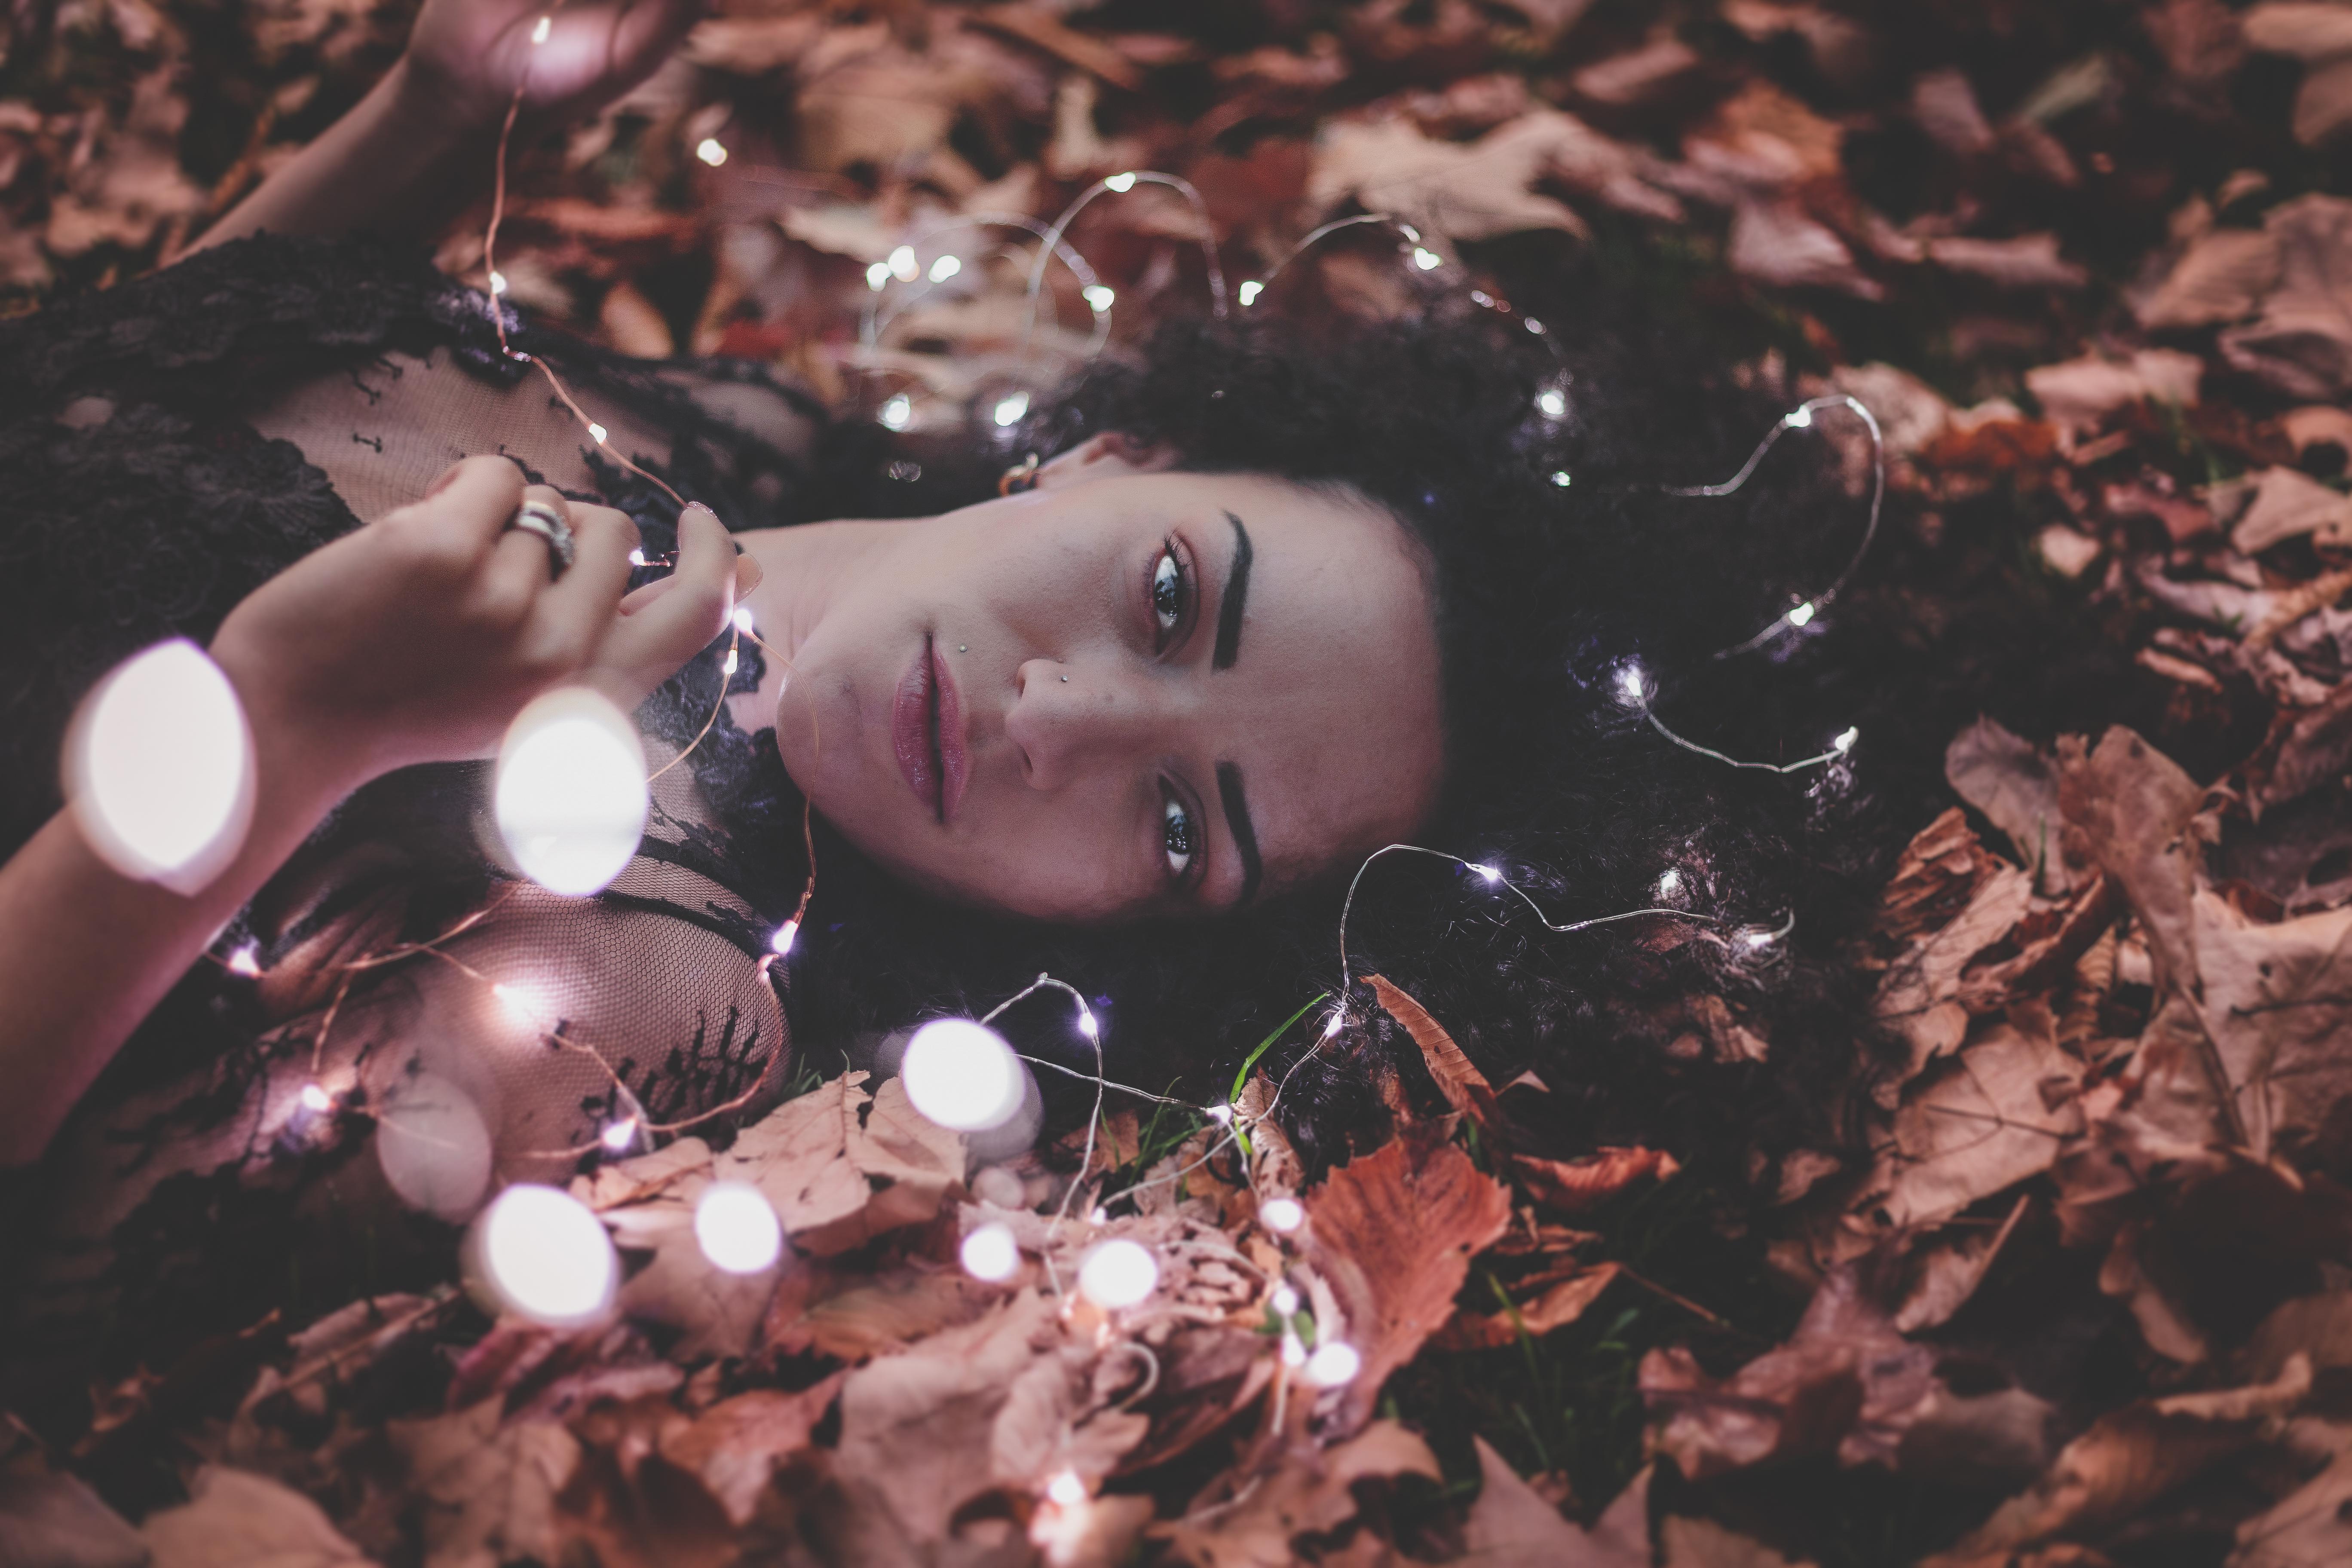 Black Hair Fall Girl Leaf Light Lipstick Lying Down Model Woman 5472x3648